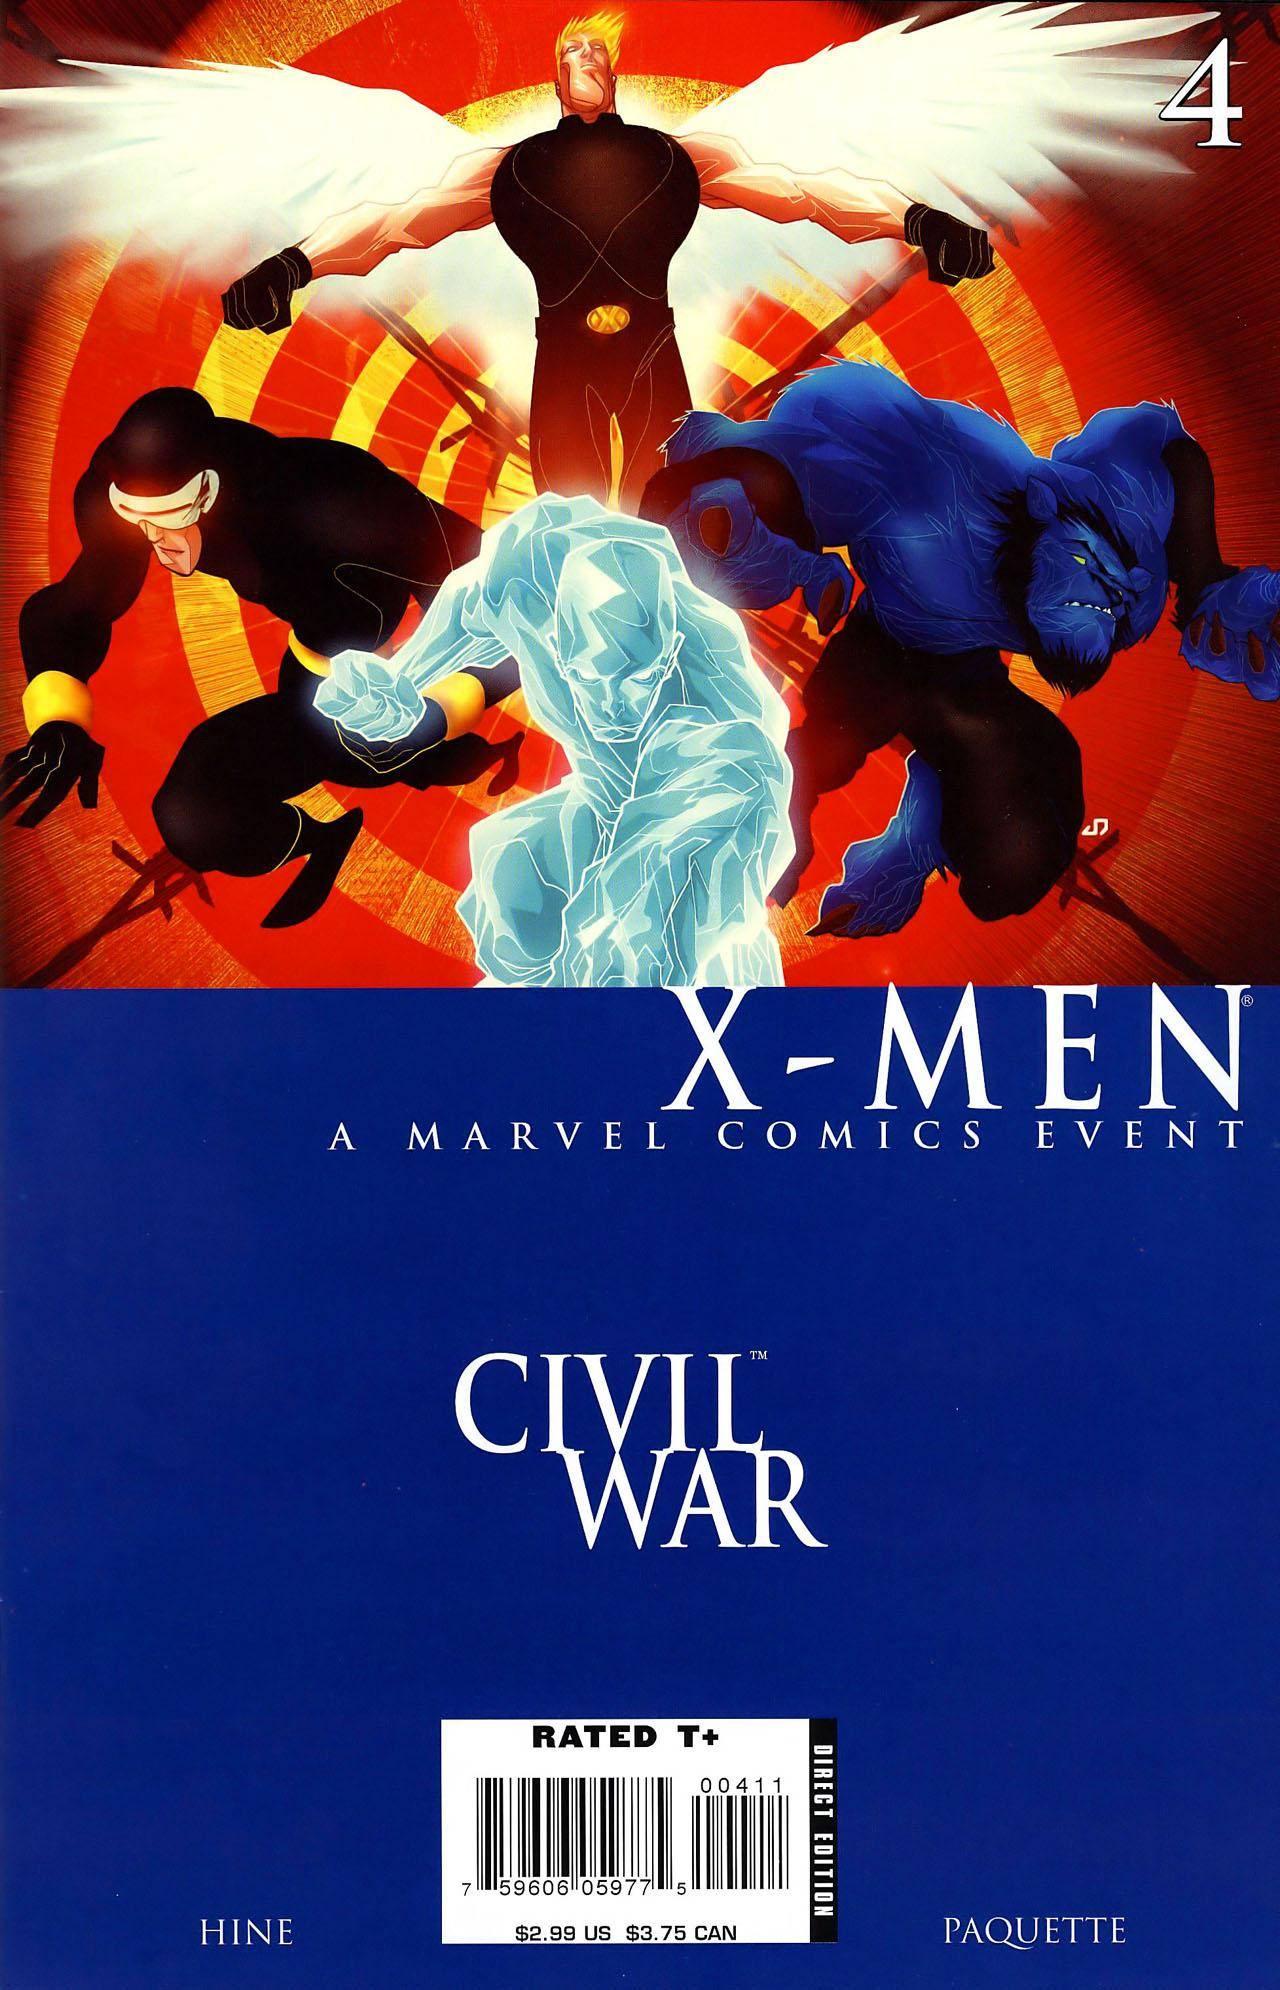 Civil War - X-Men 04